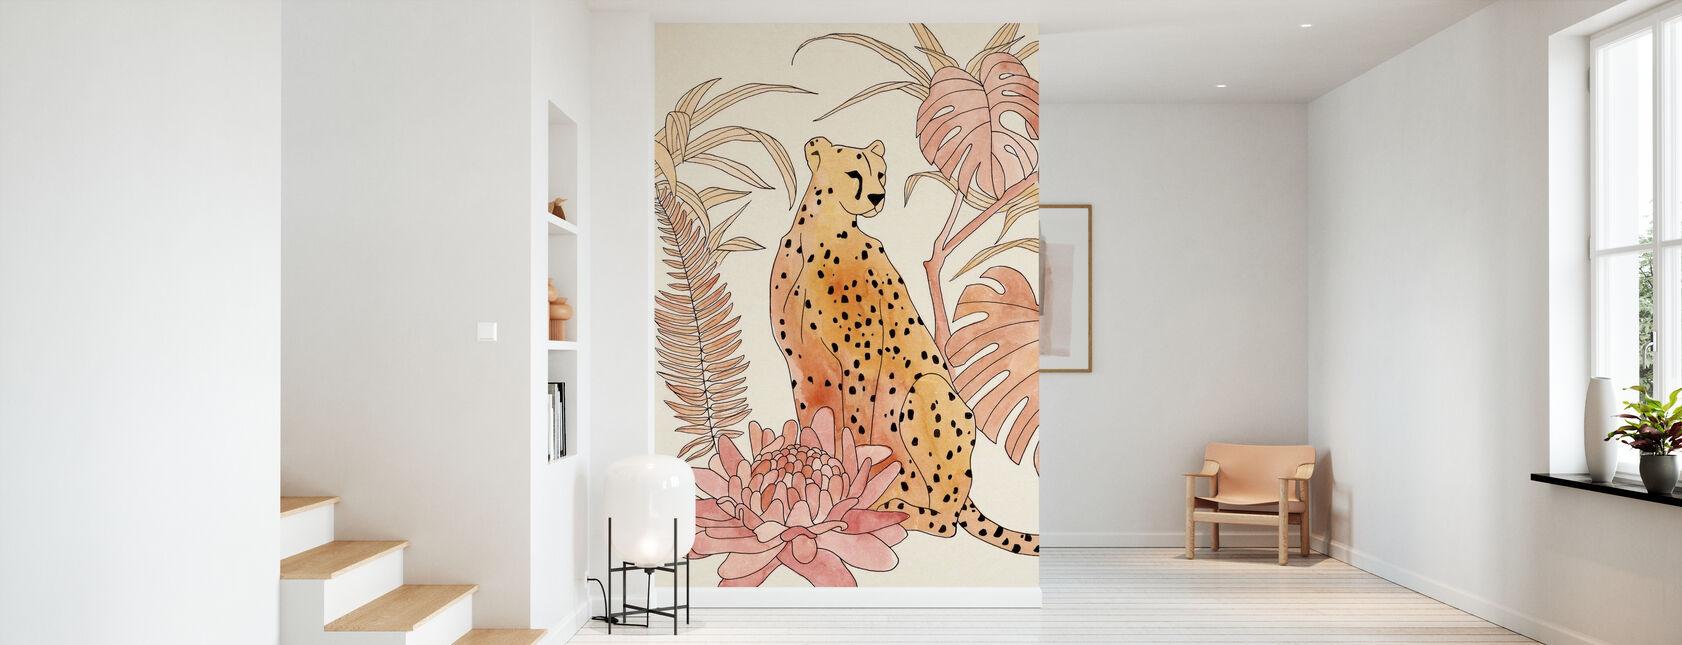 Blush Cheetah - Wallpaper - Hallway